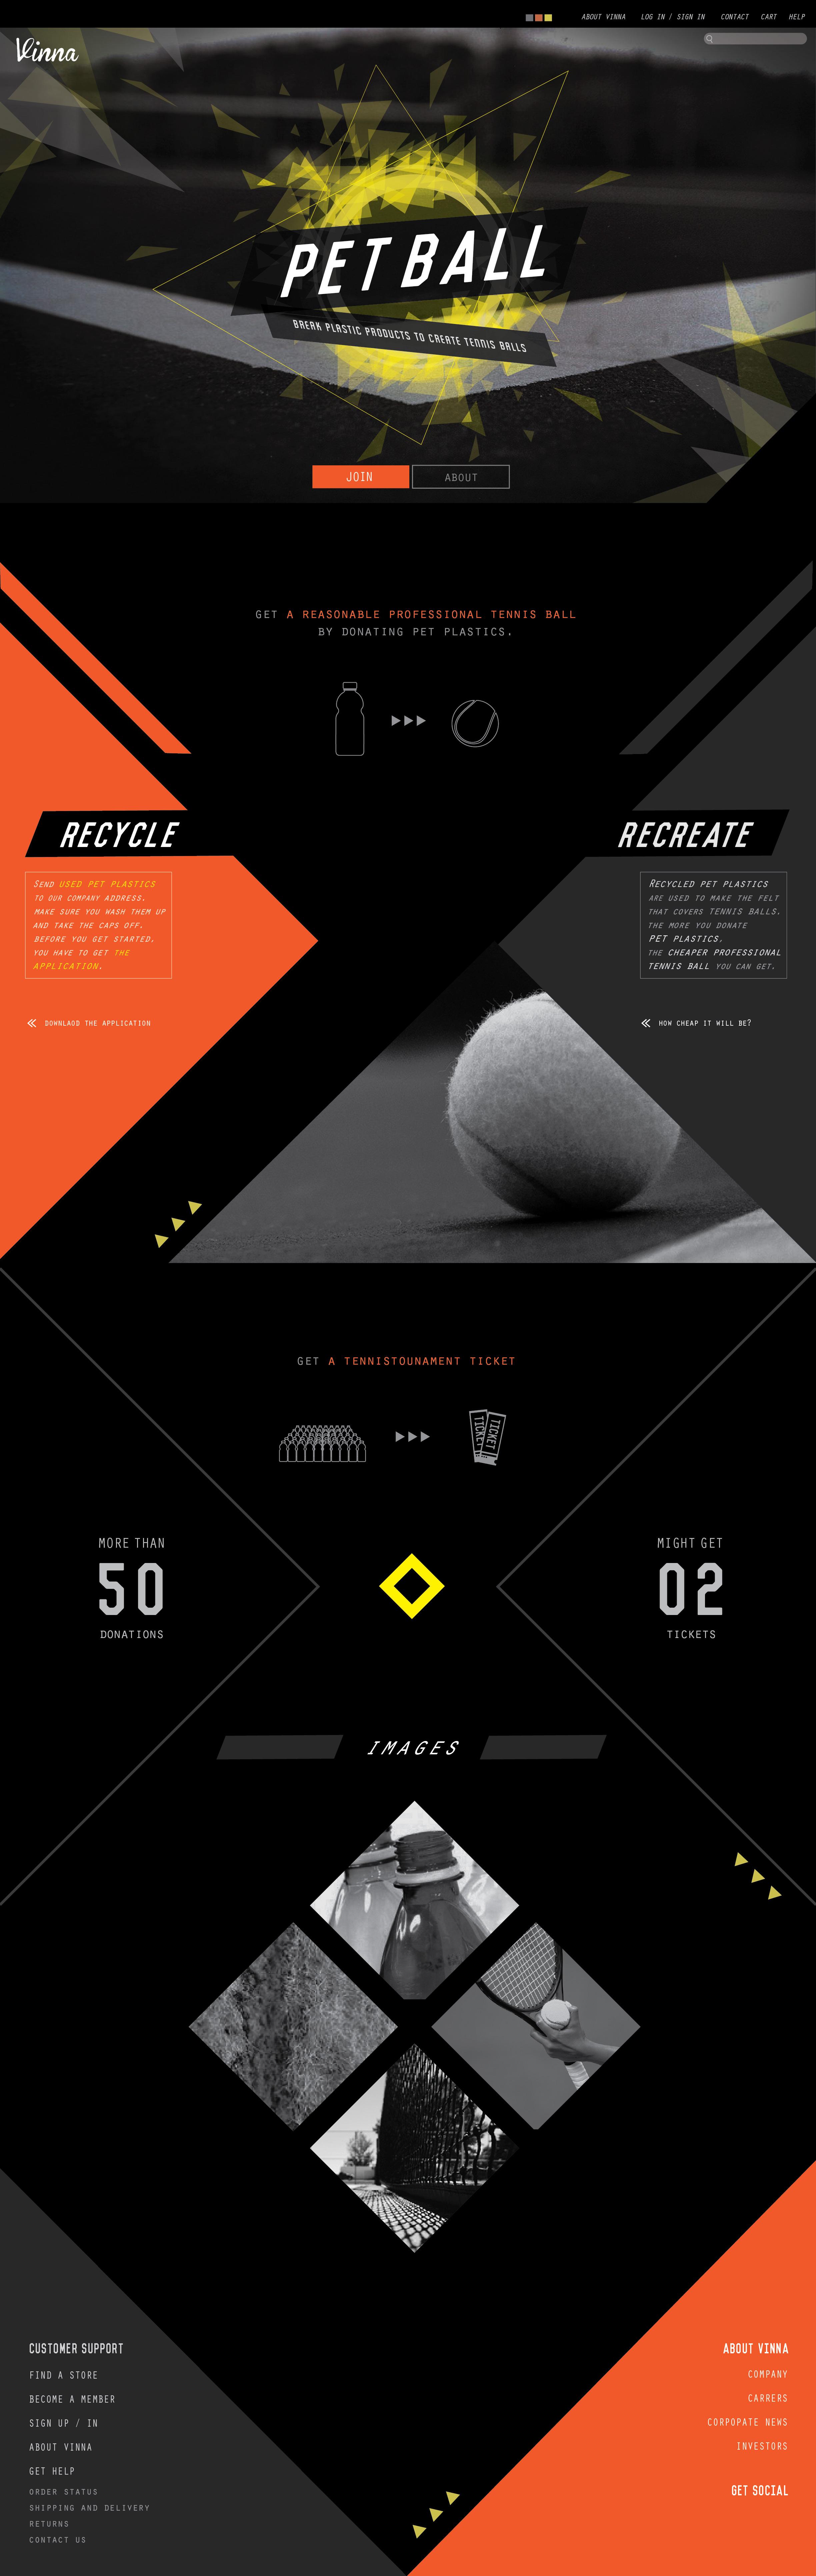 web_interface